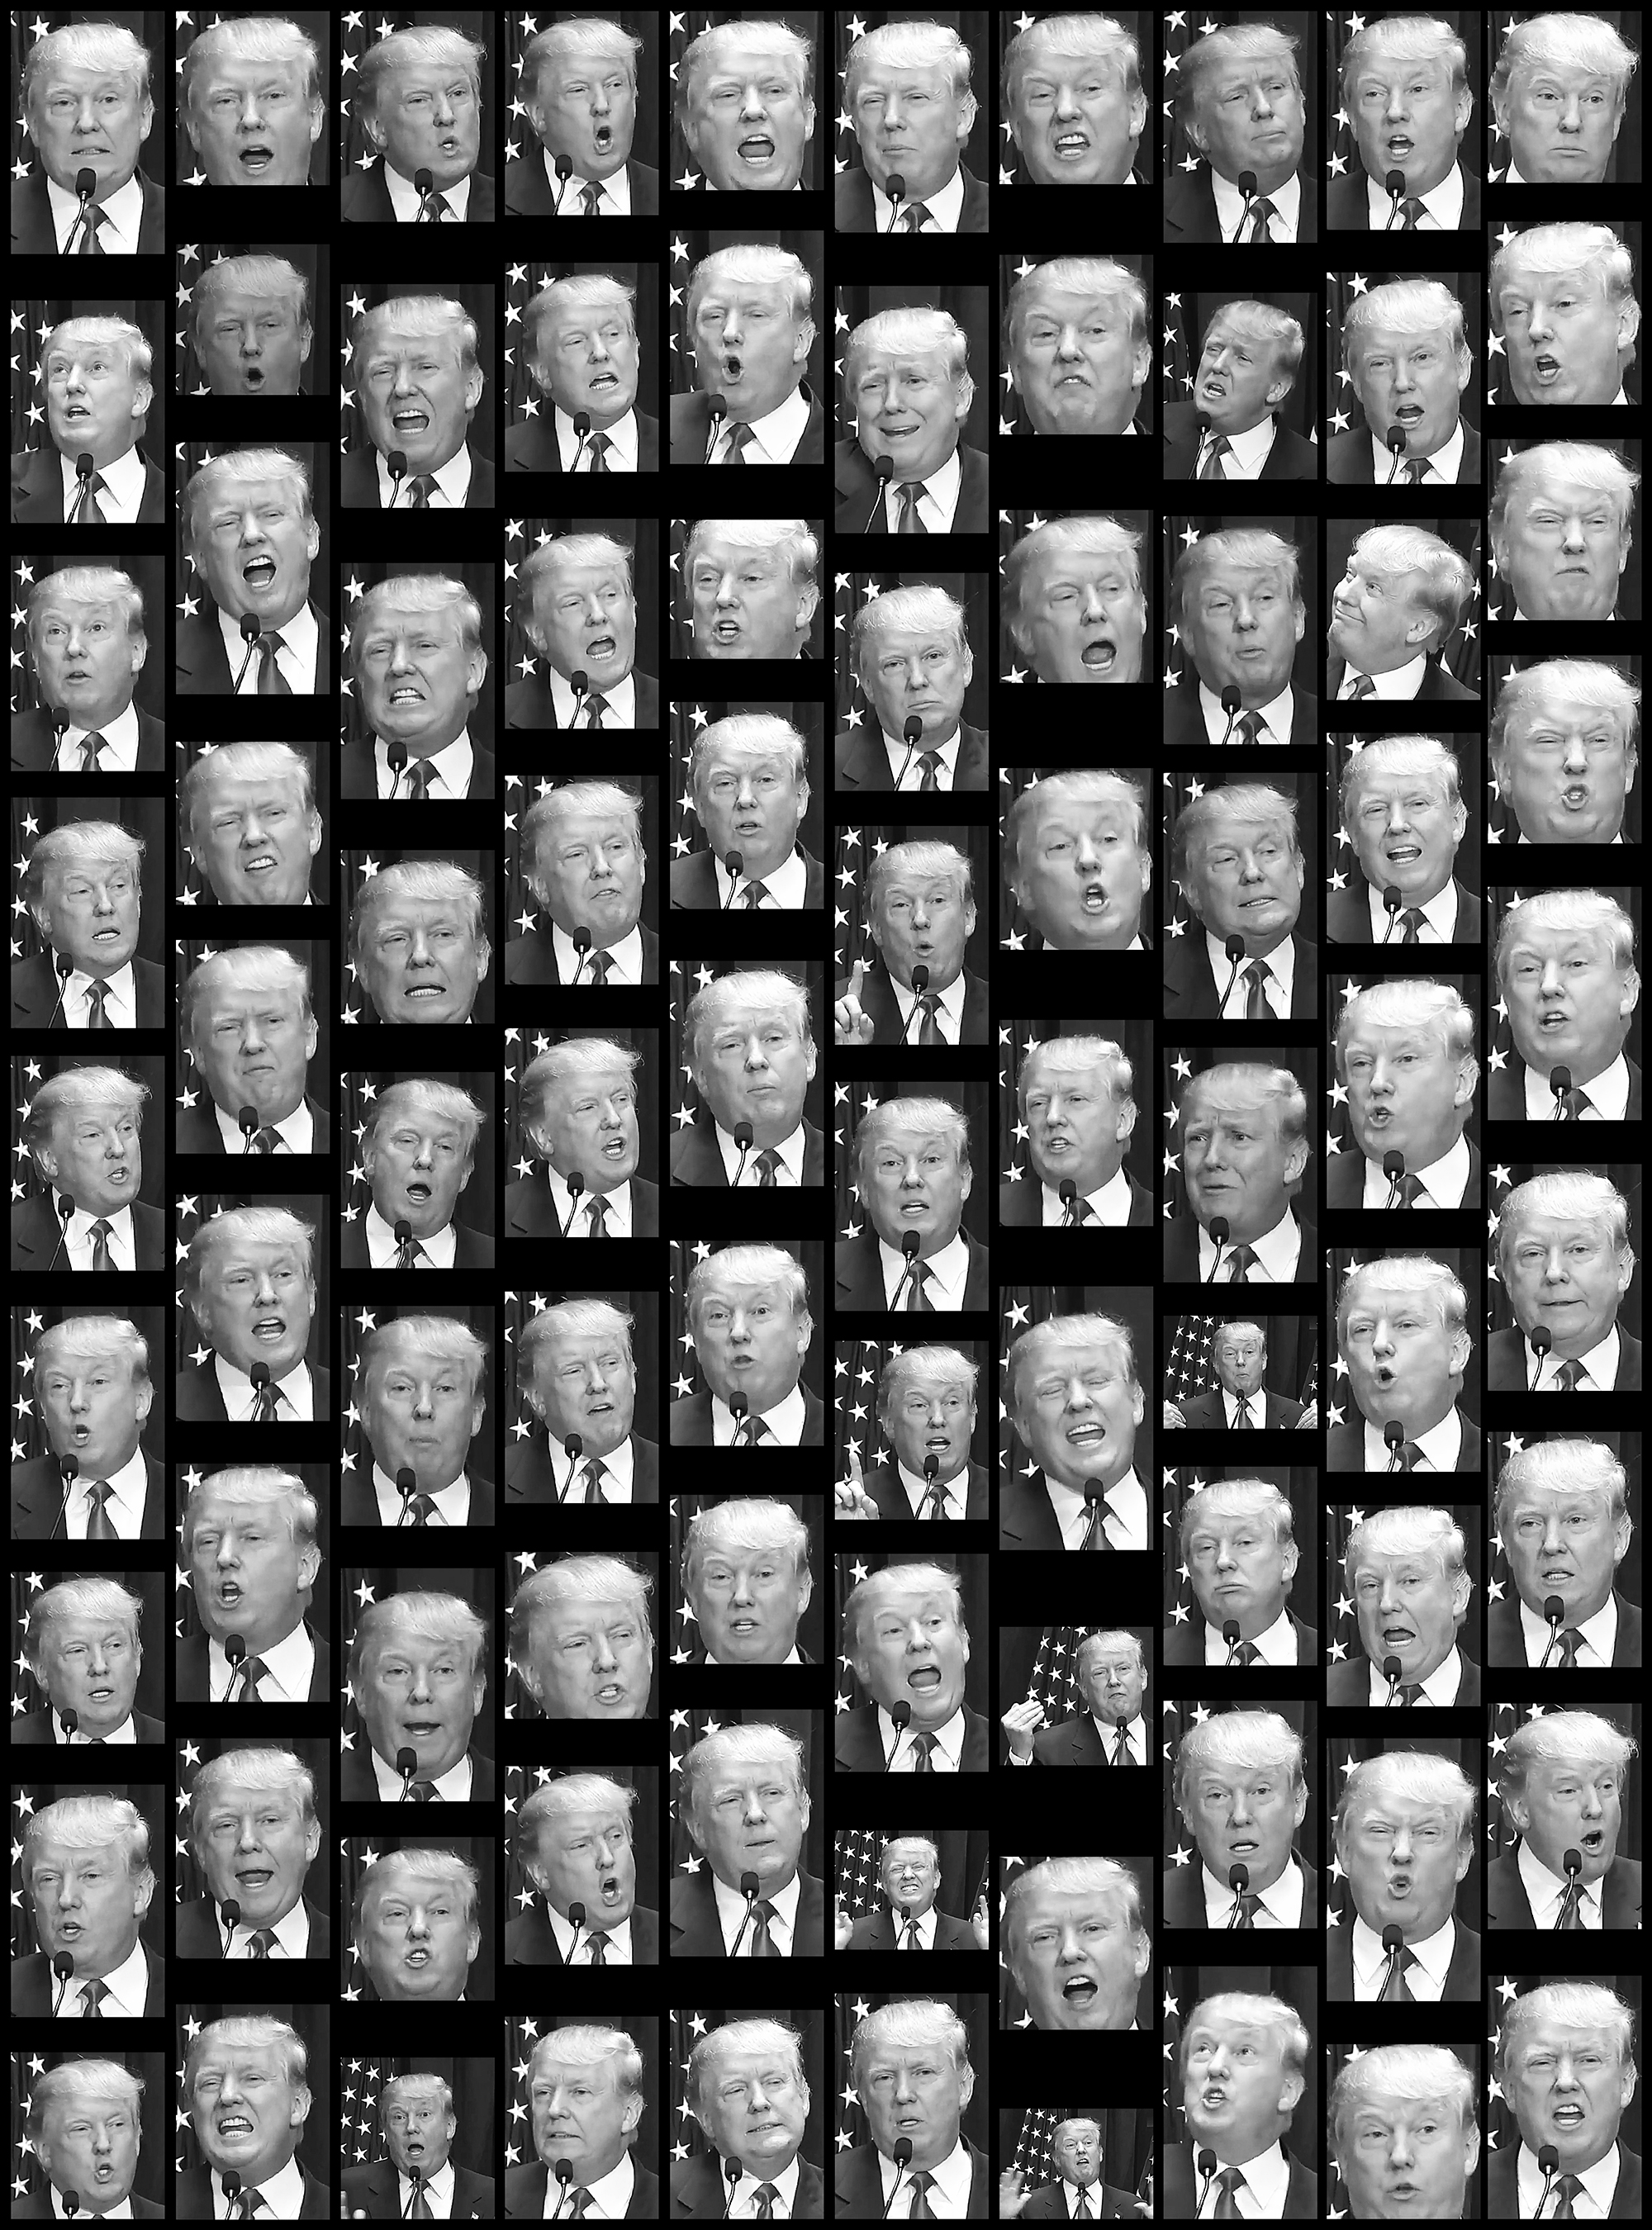 Donald_10_columns_Print_40x54 copy.jpg